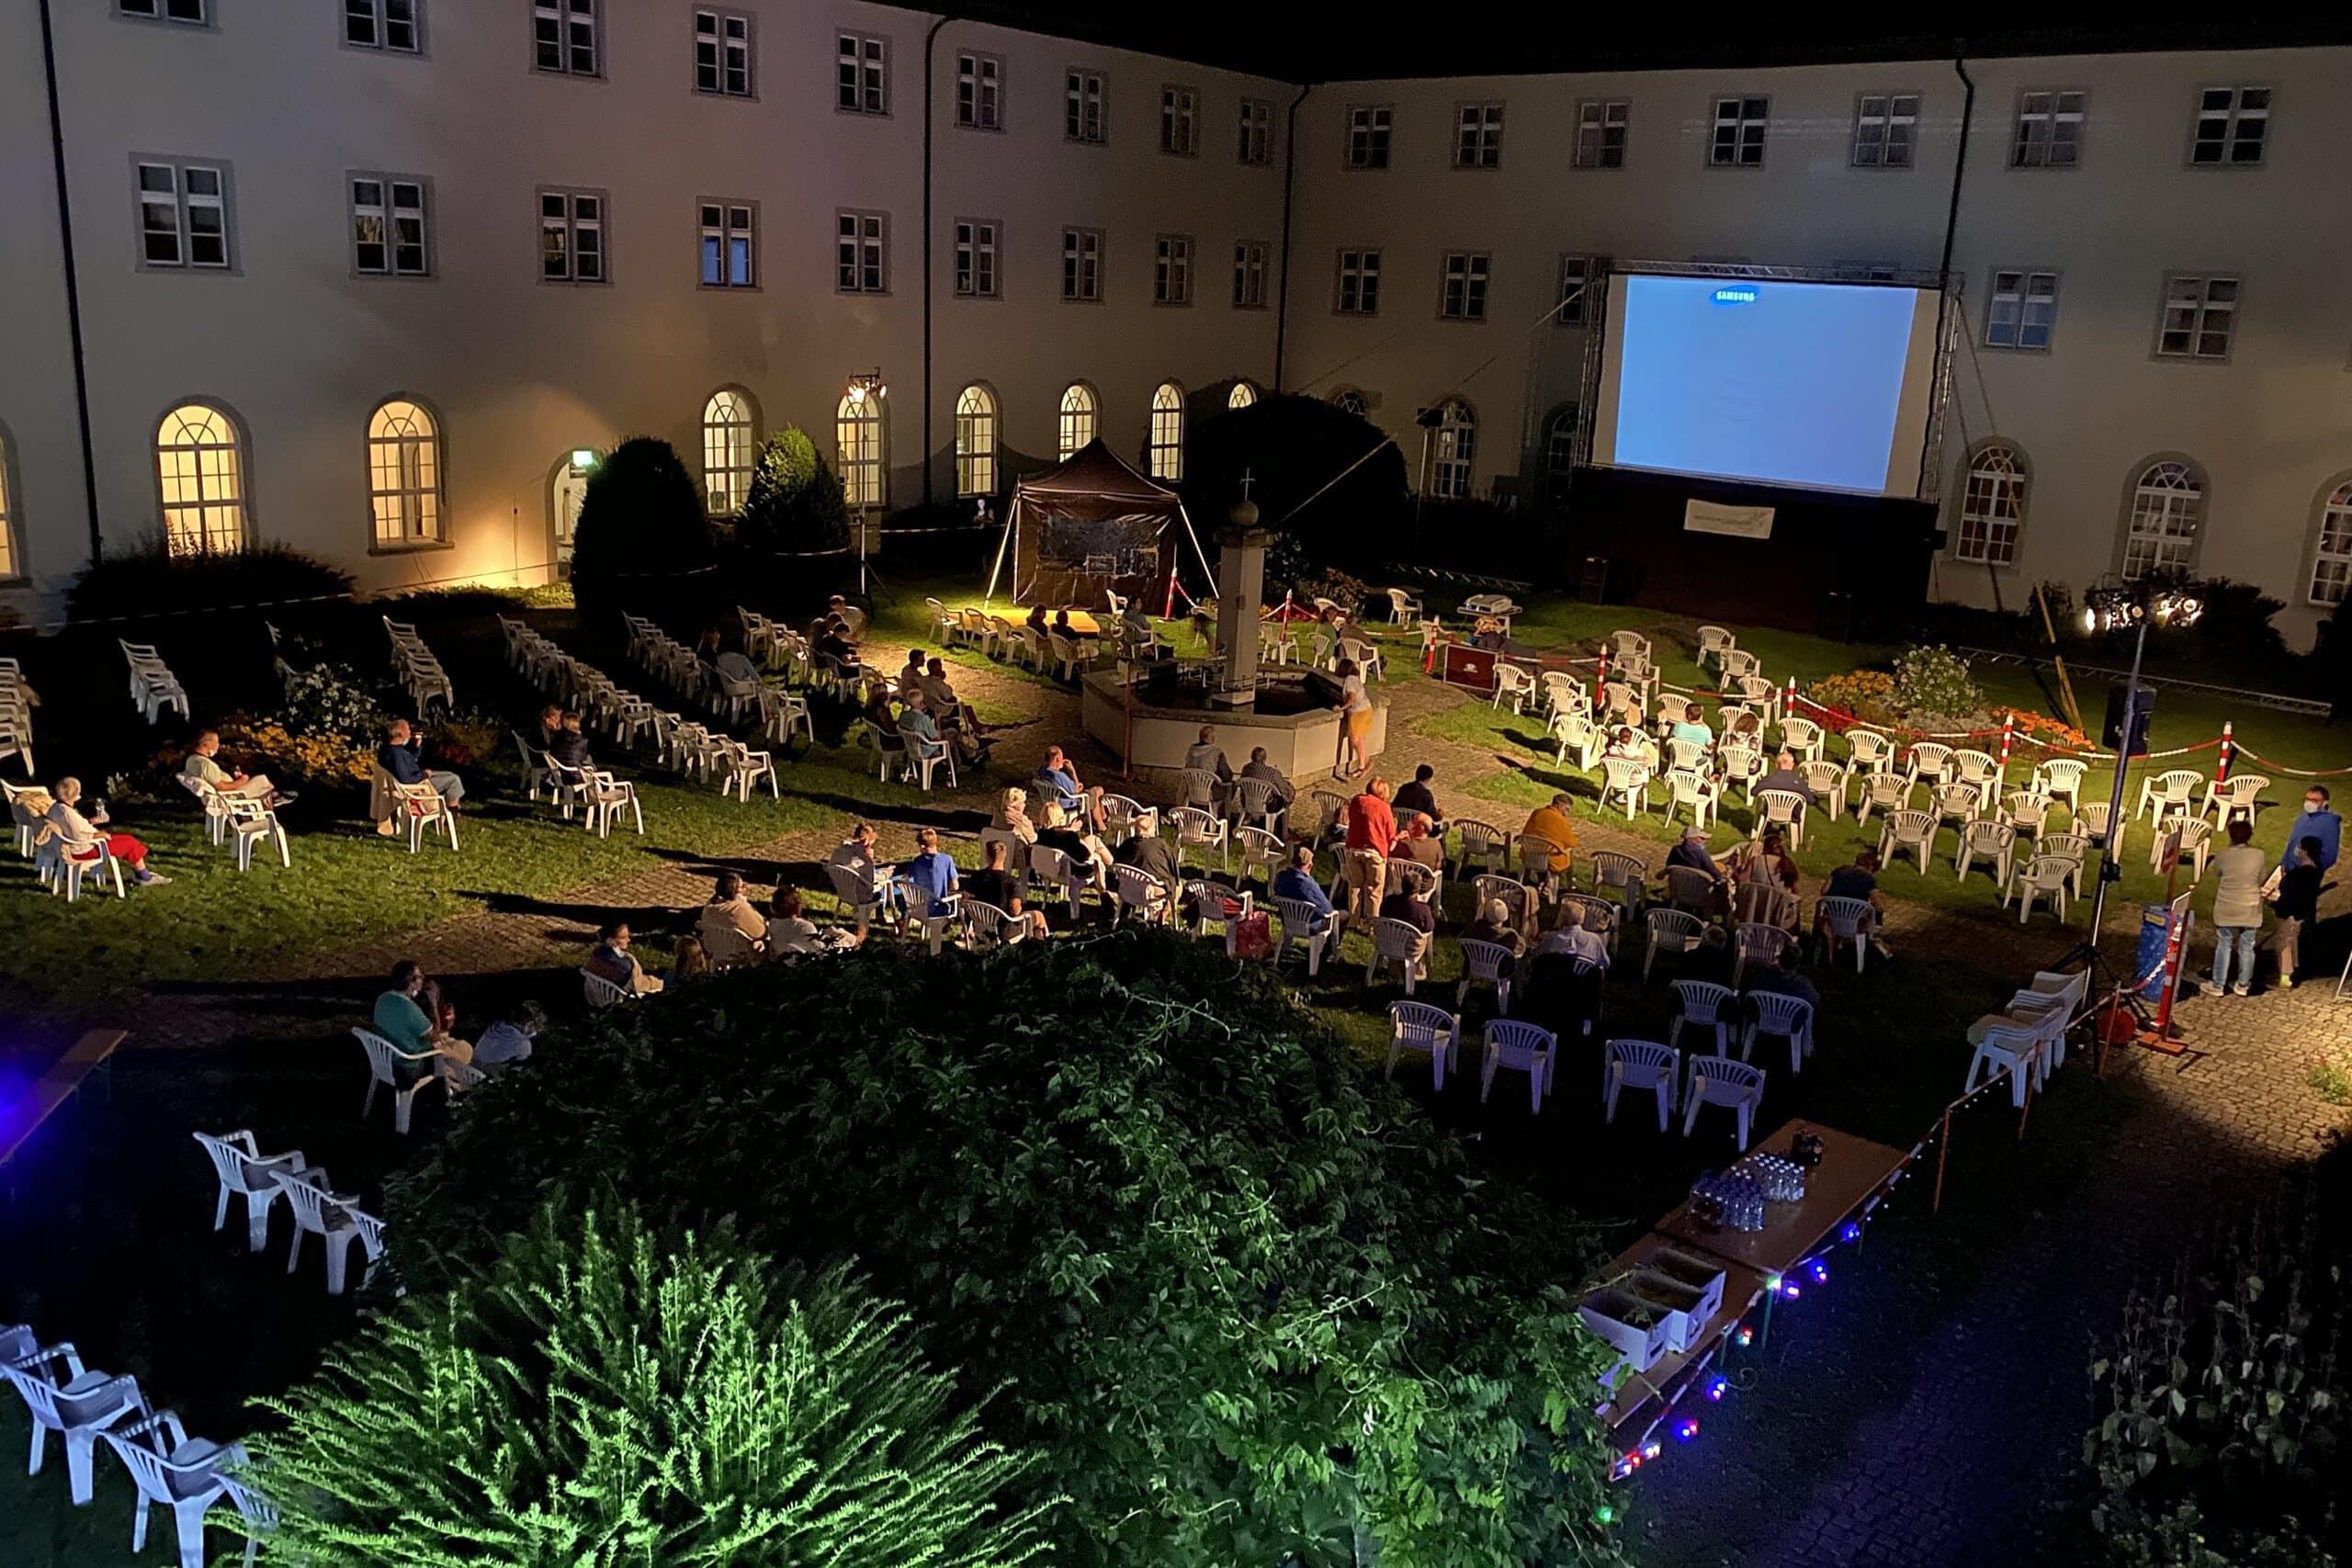 Open Air Kino Hamburg Schanzenpark